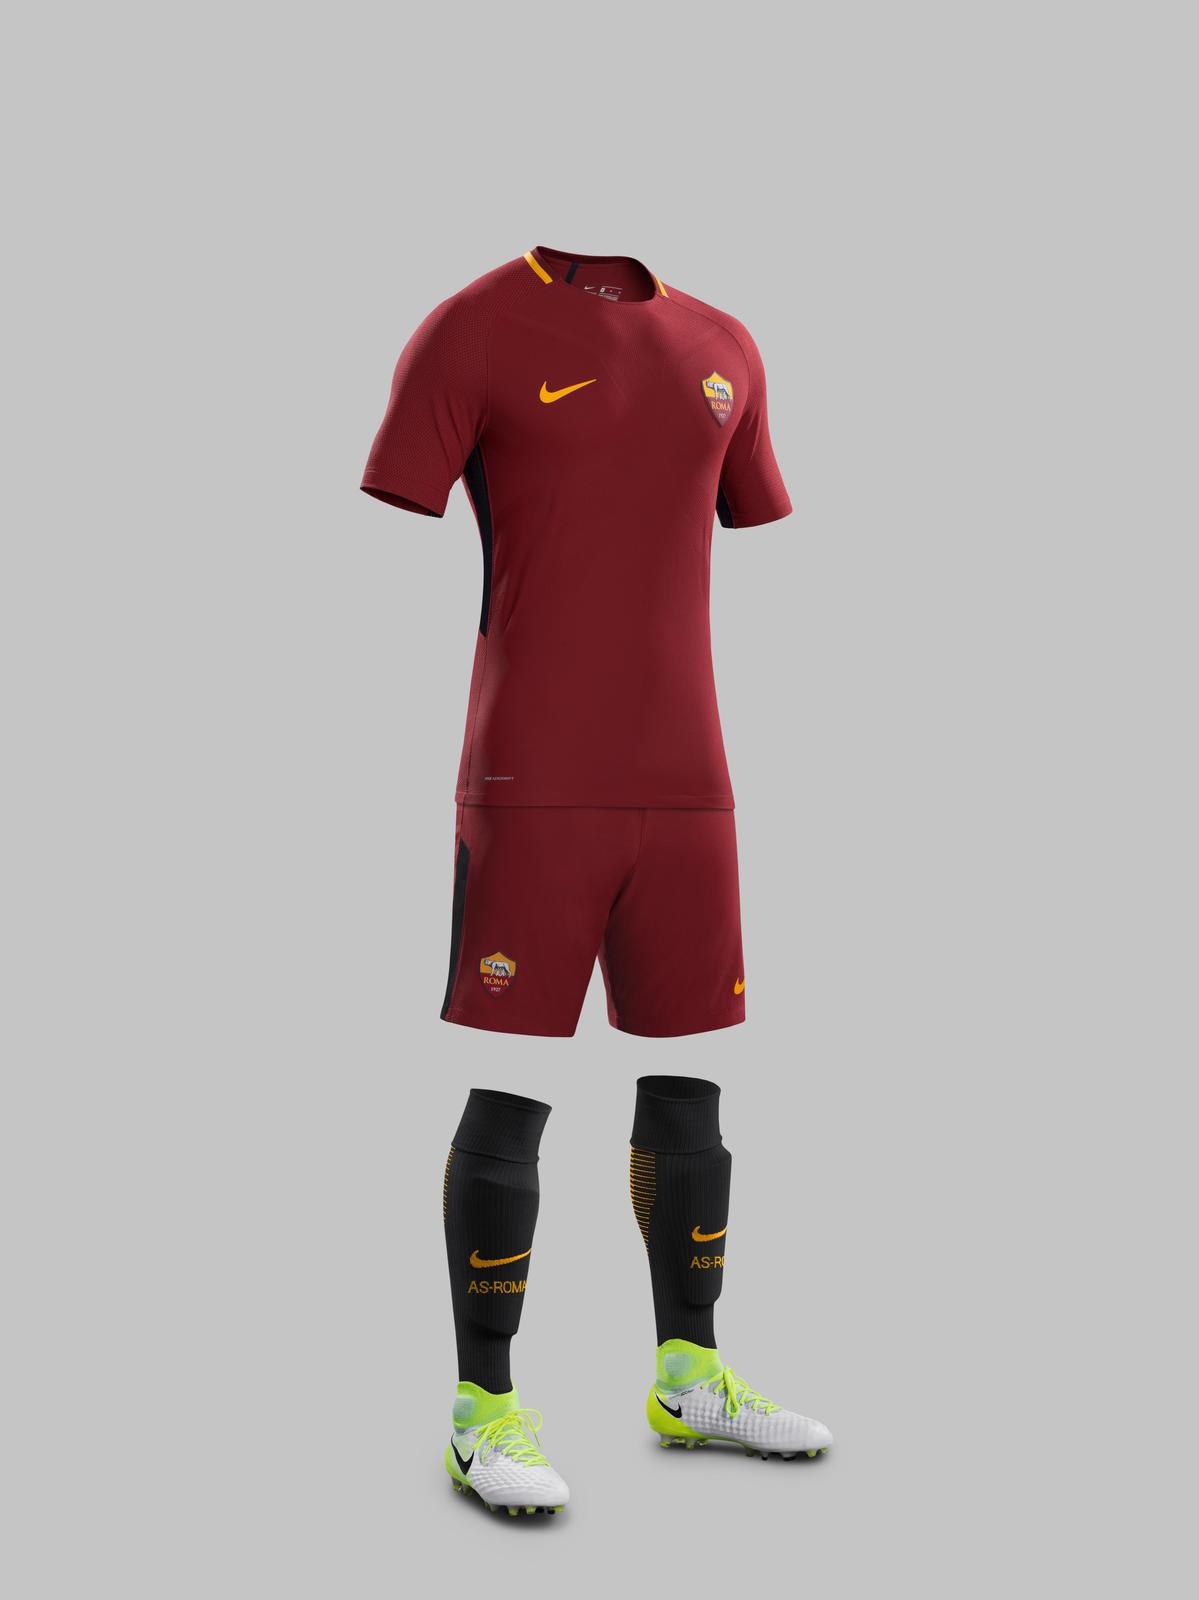 as roma kits 2018